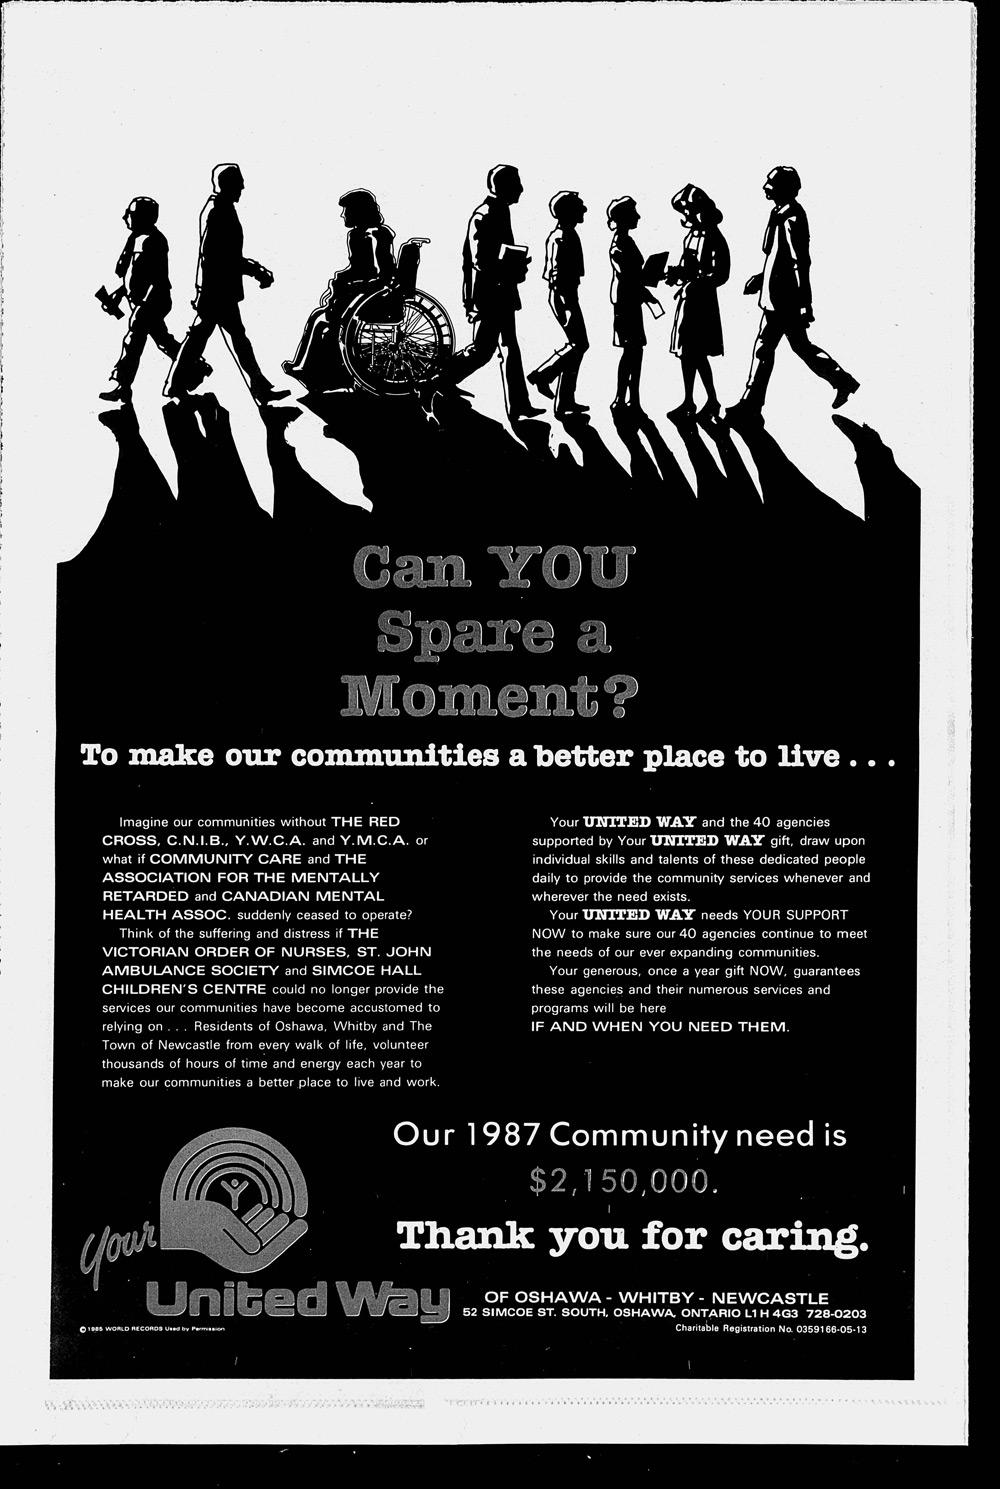 Whitby Free Press, 24 Sep 1986